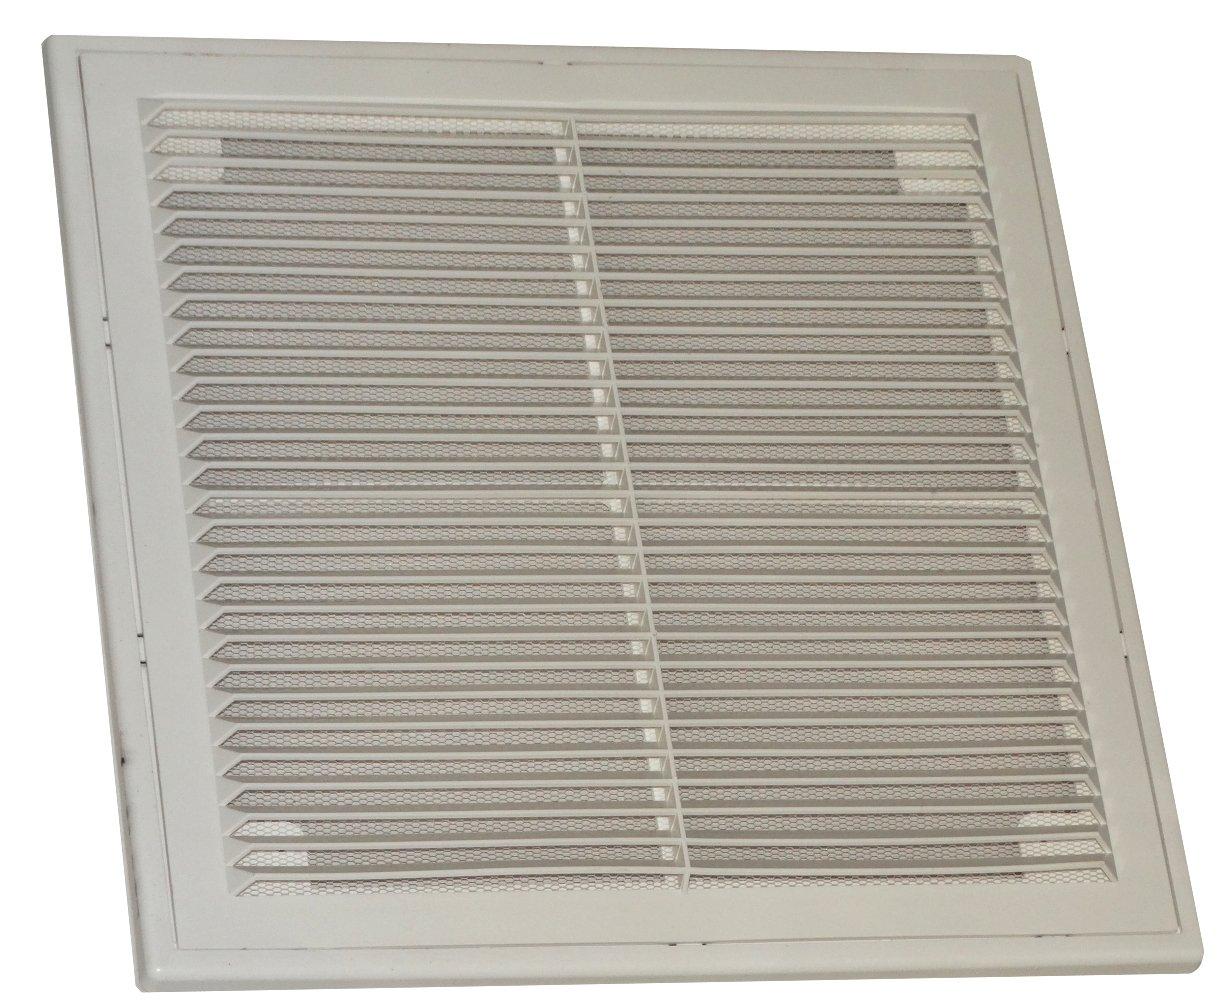 AERZETIX: Plastic, Square Air Ventilation Grille 300mm x 300mm. 3800946199281